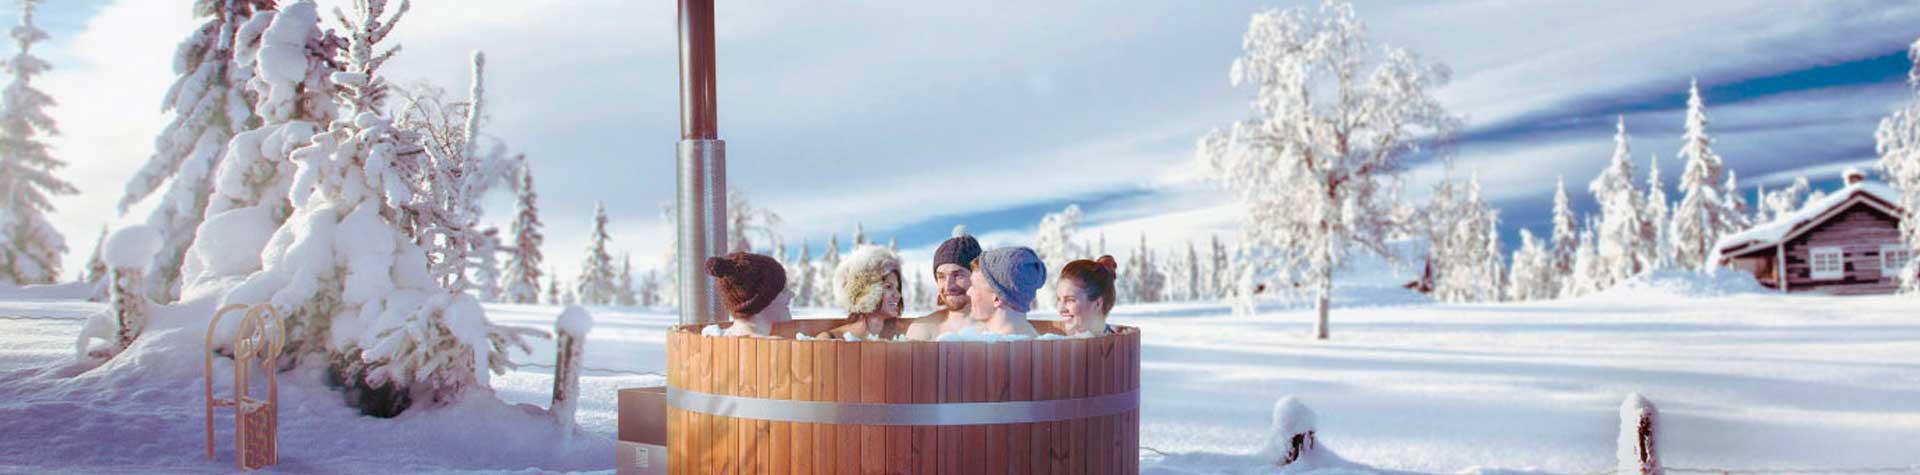 Home » Bad & Sauna » Finnische Badetonne, Badezuber, Badefass » Kirami Comfort Badefässer Coz